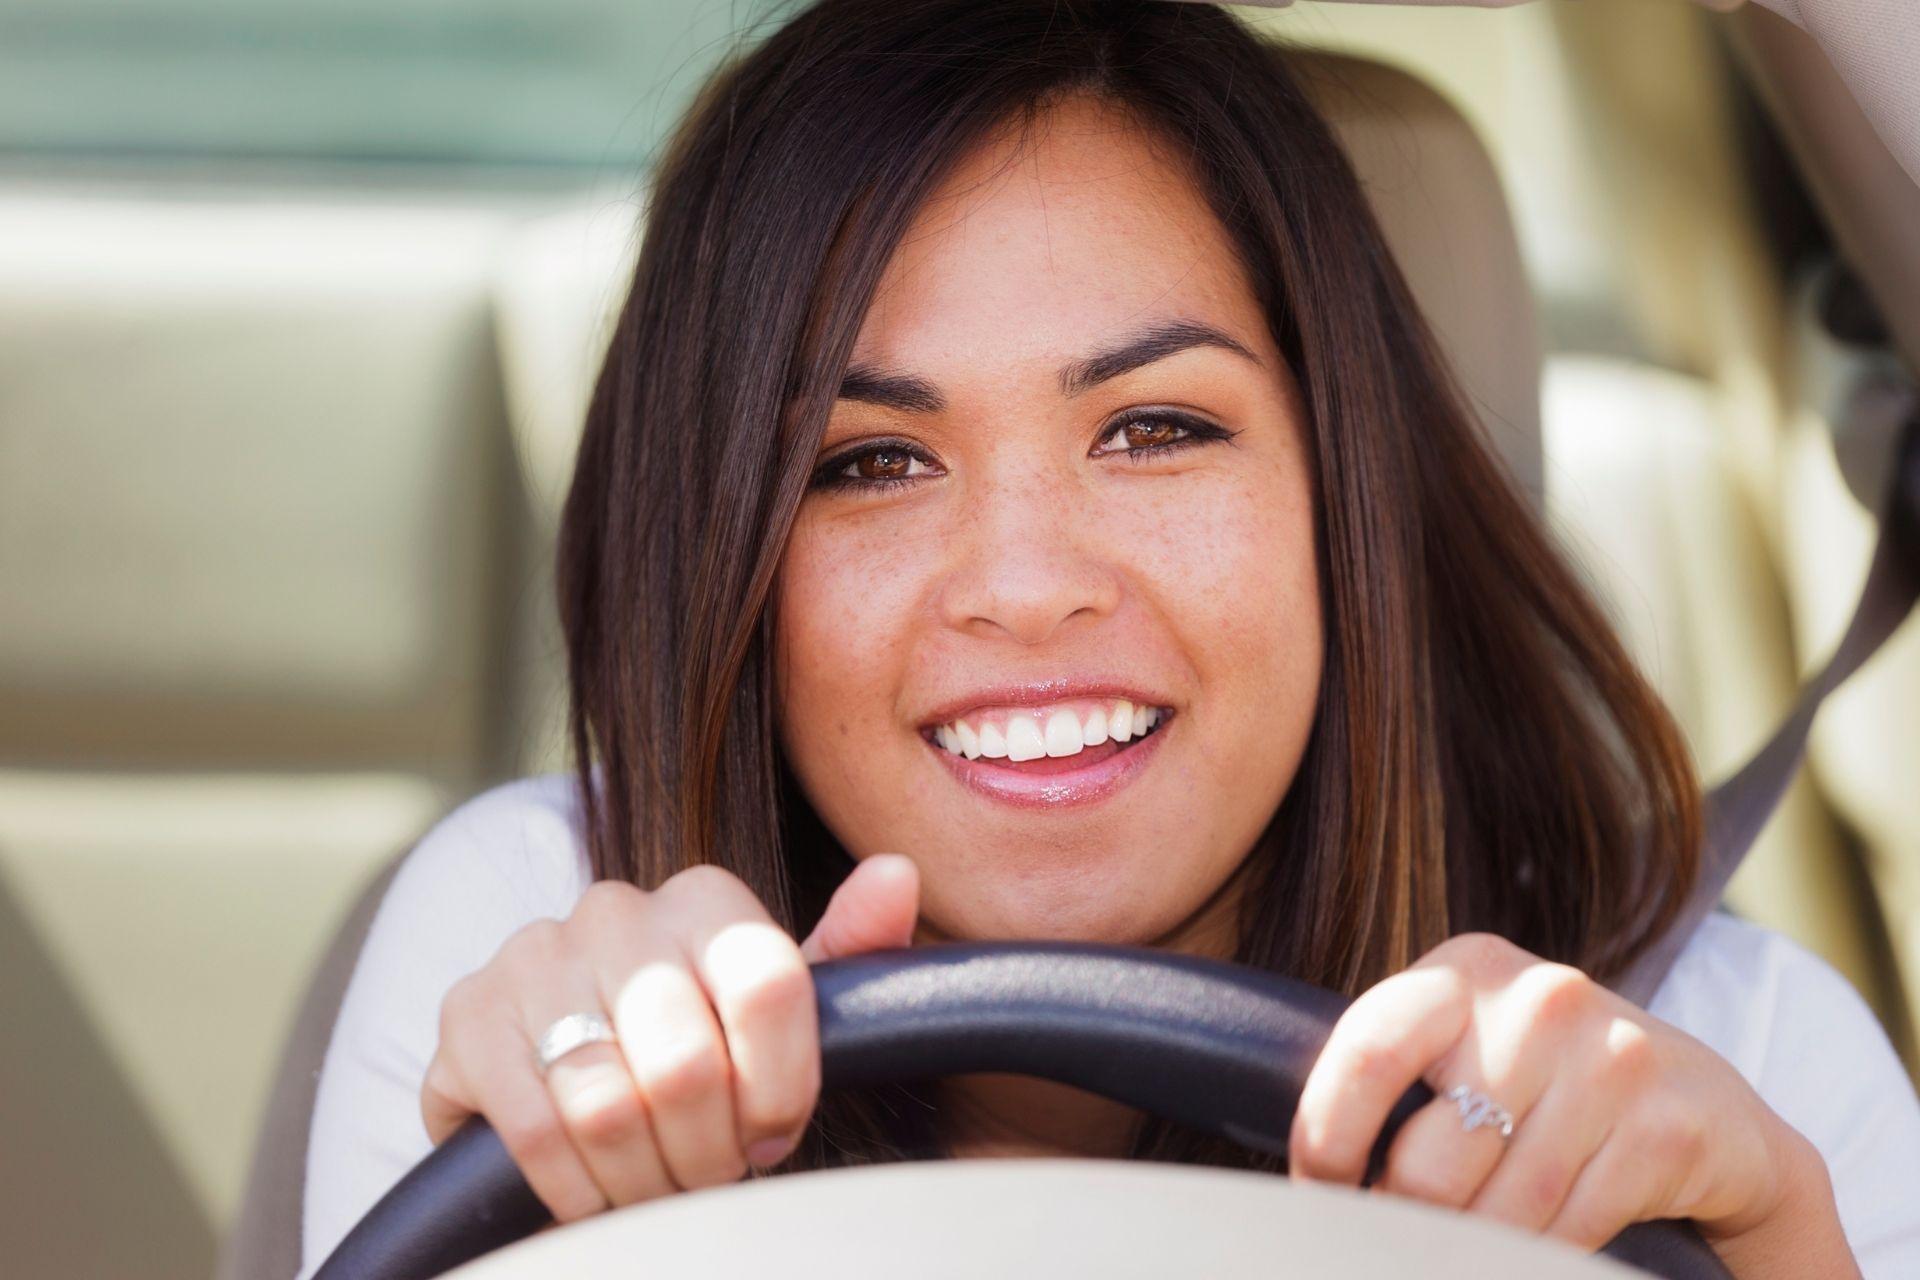 placer al volante-conducir